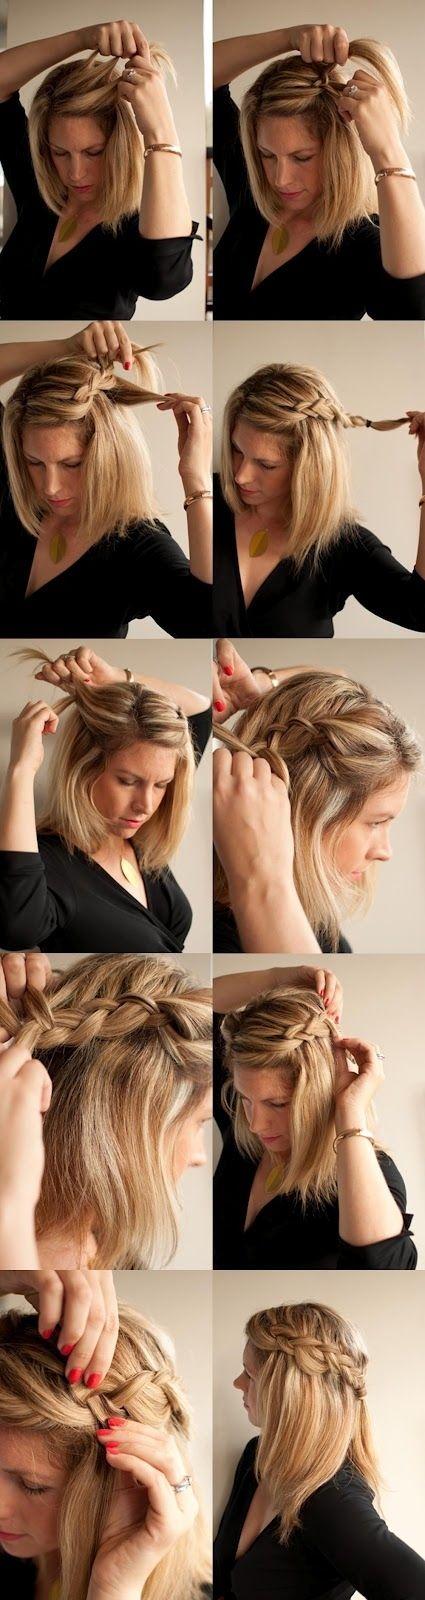 Cascade Braids for Medium-Length Hair | How To Get Summer's 27 Best Hairstyles